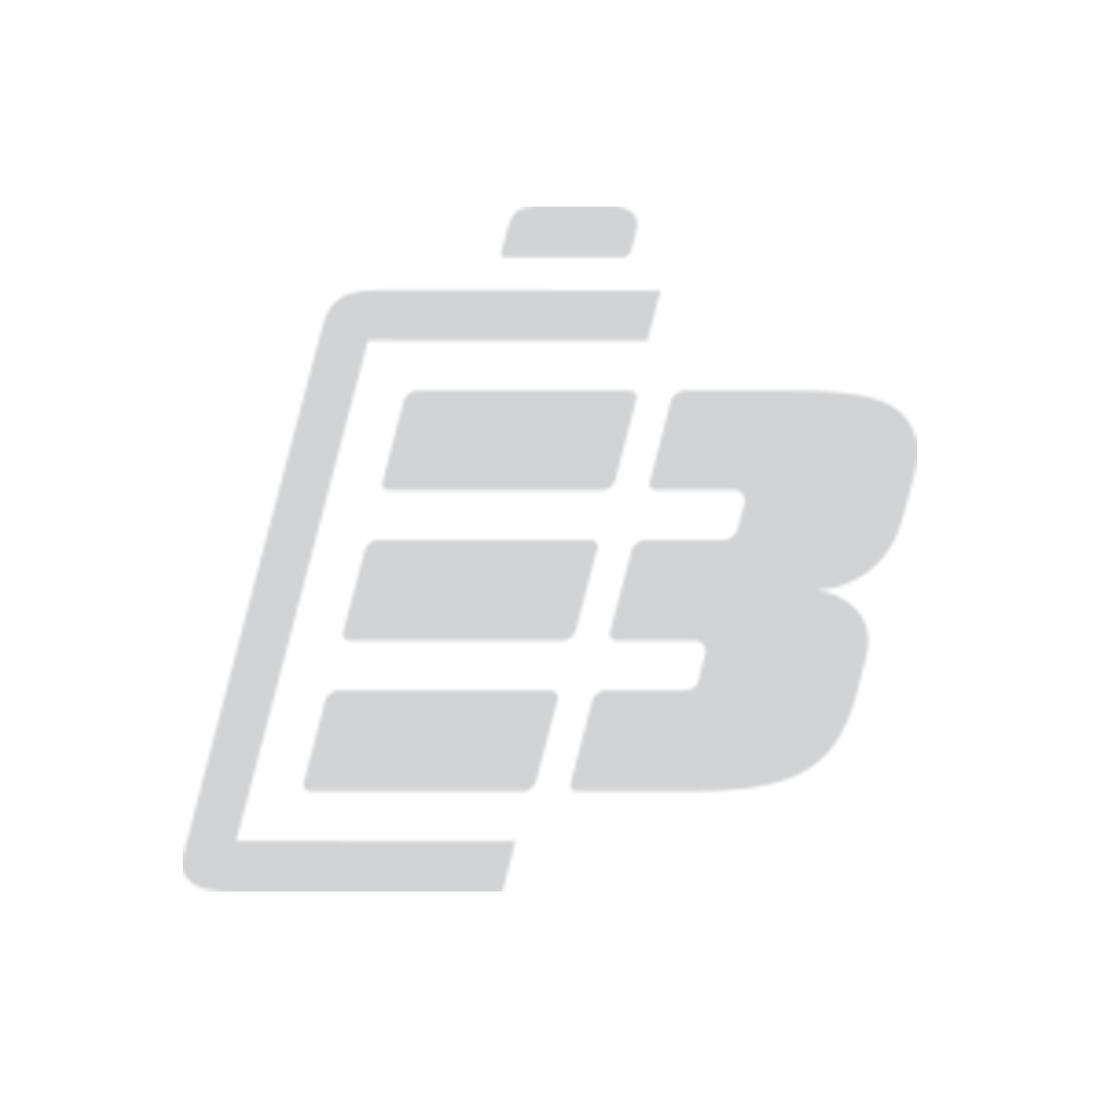 Smartphone battery Apple iPhone SE_1